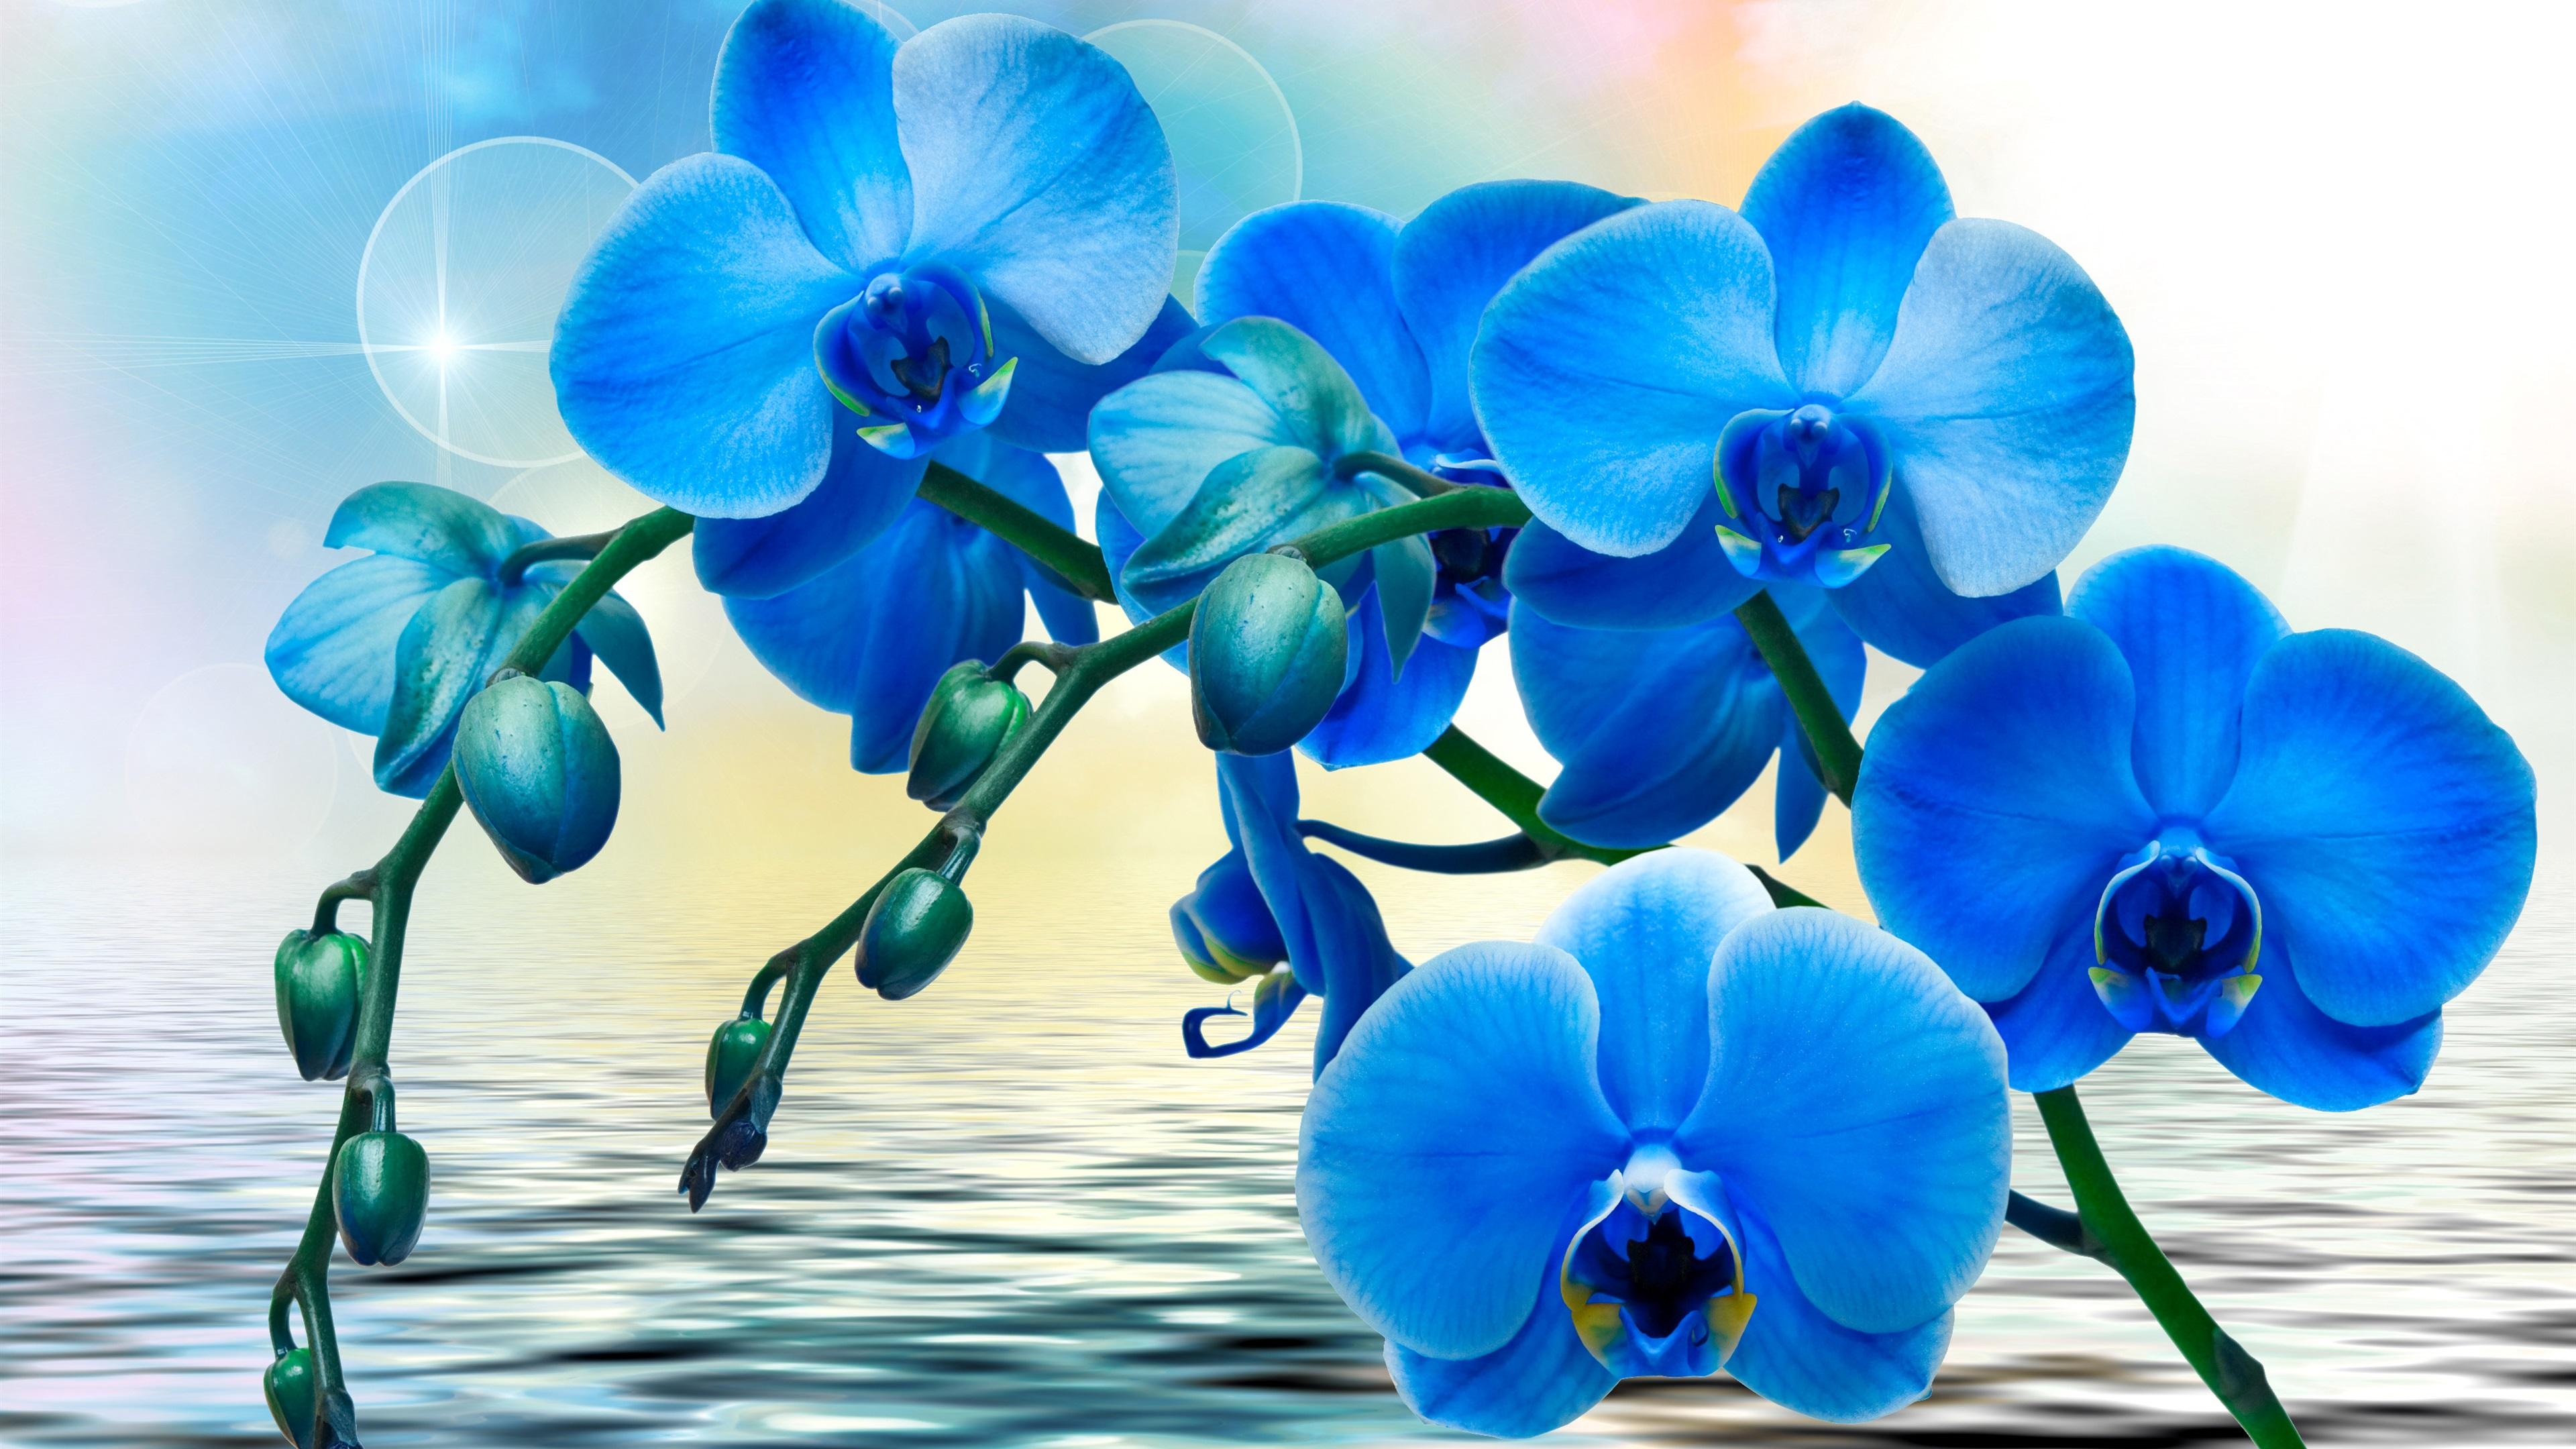 Wallpaper orchids blue flowers phalaenopsis water 3840x2160 uhd orchidsblueflowersphalaenopsiswater original resolution 3840x2160 download this wallpaper izmirmasajfo